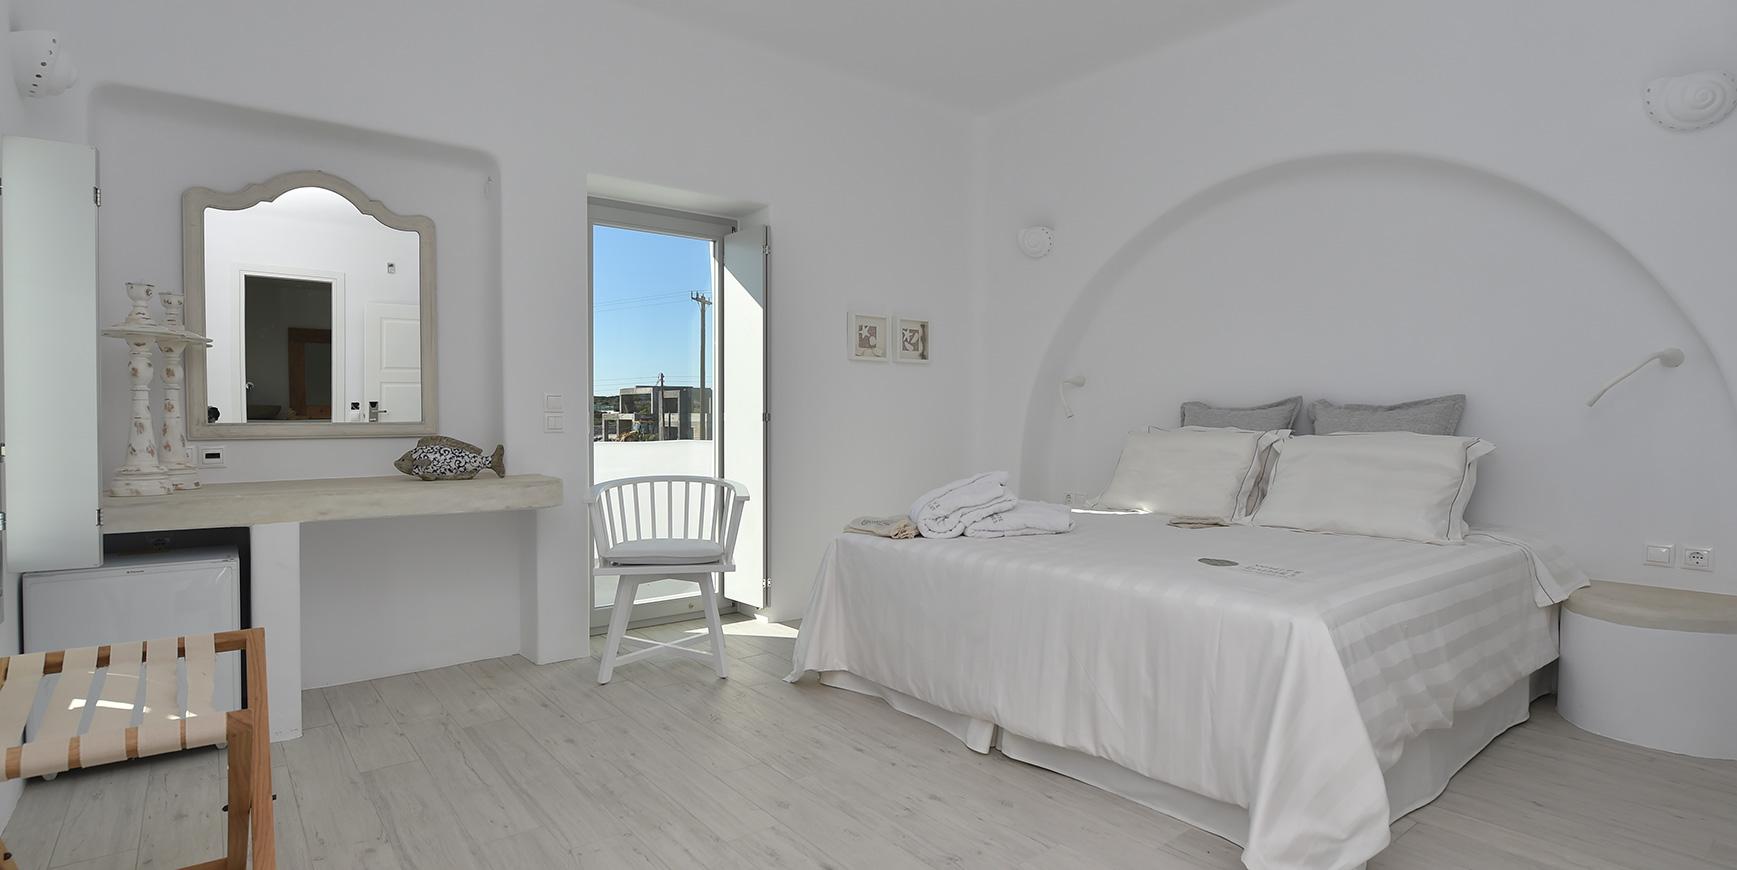 Luxury Hotel Room in Paros